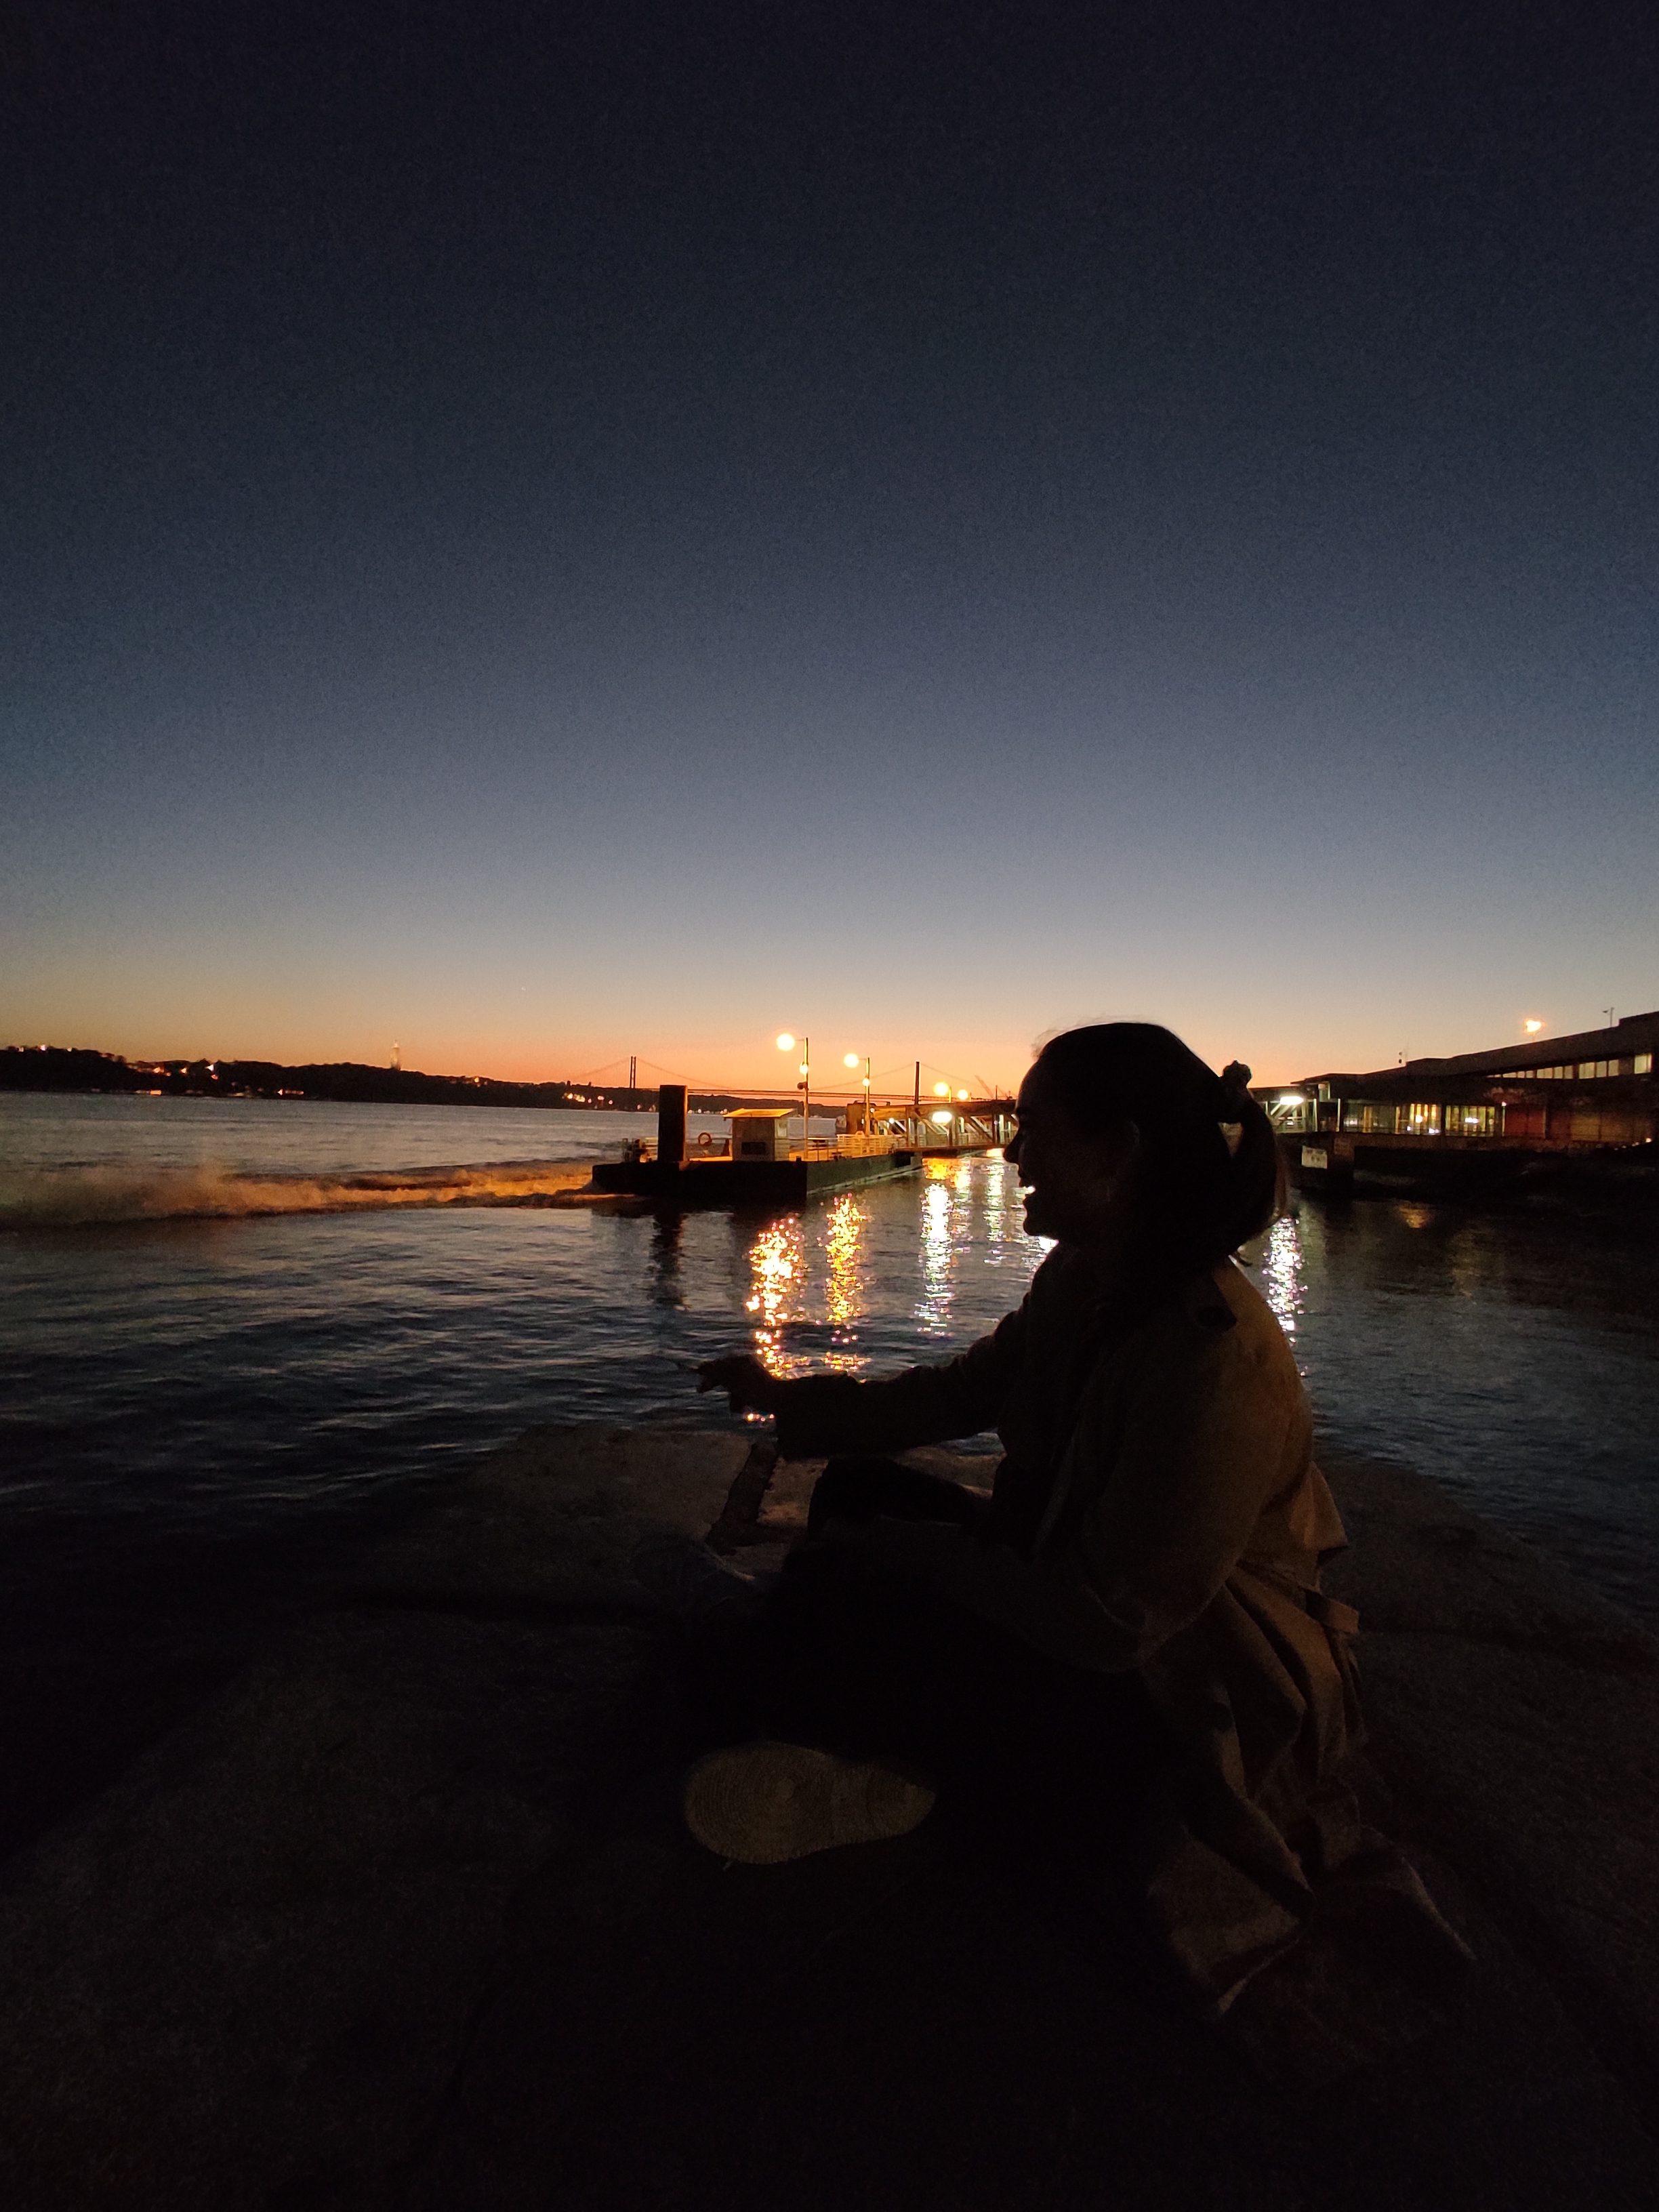 Sunset at Cais do Sodré